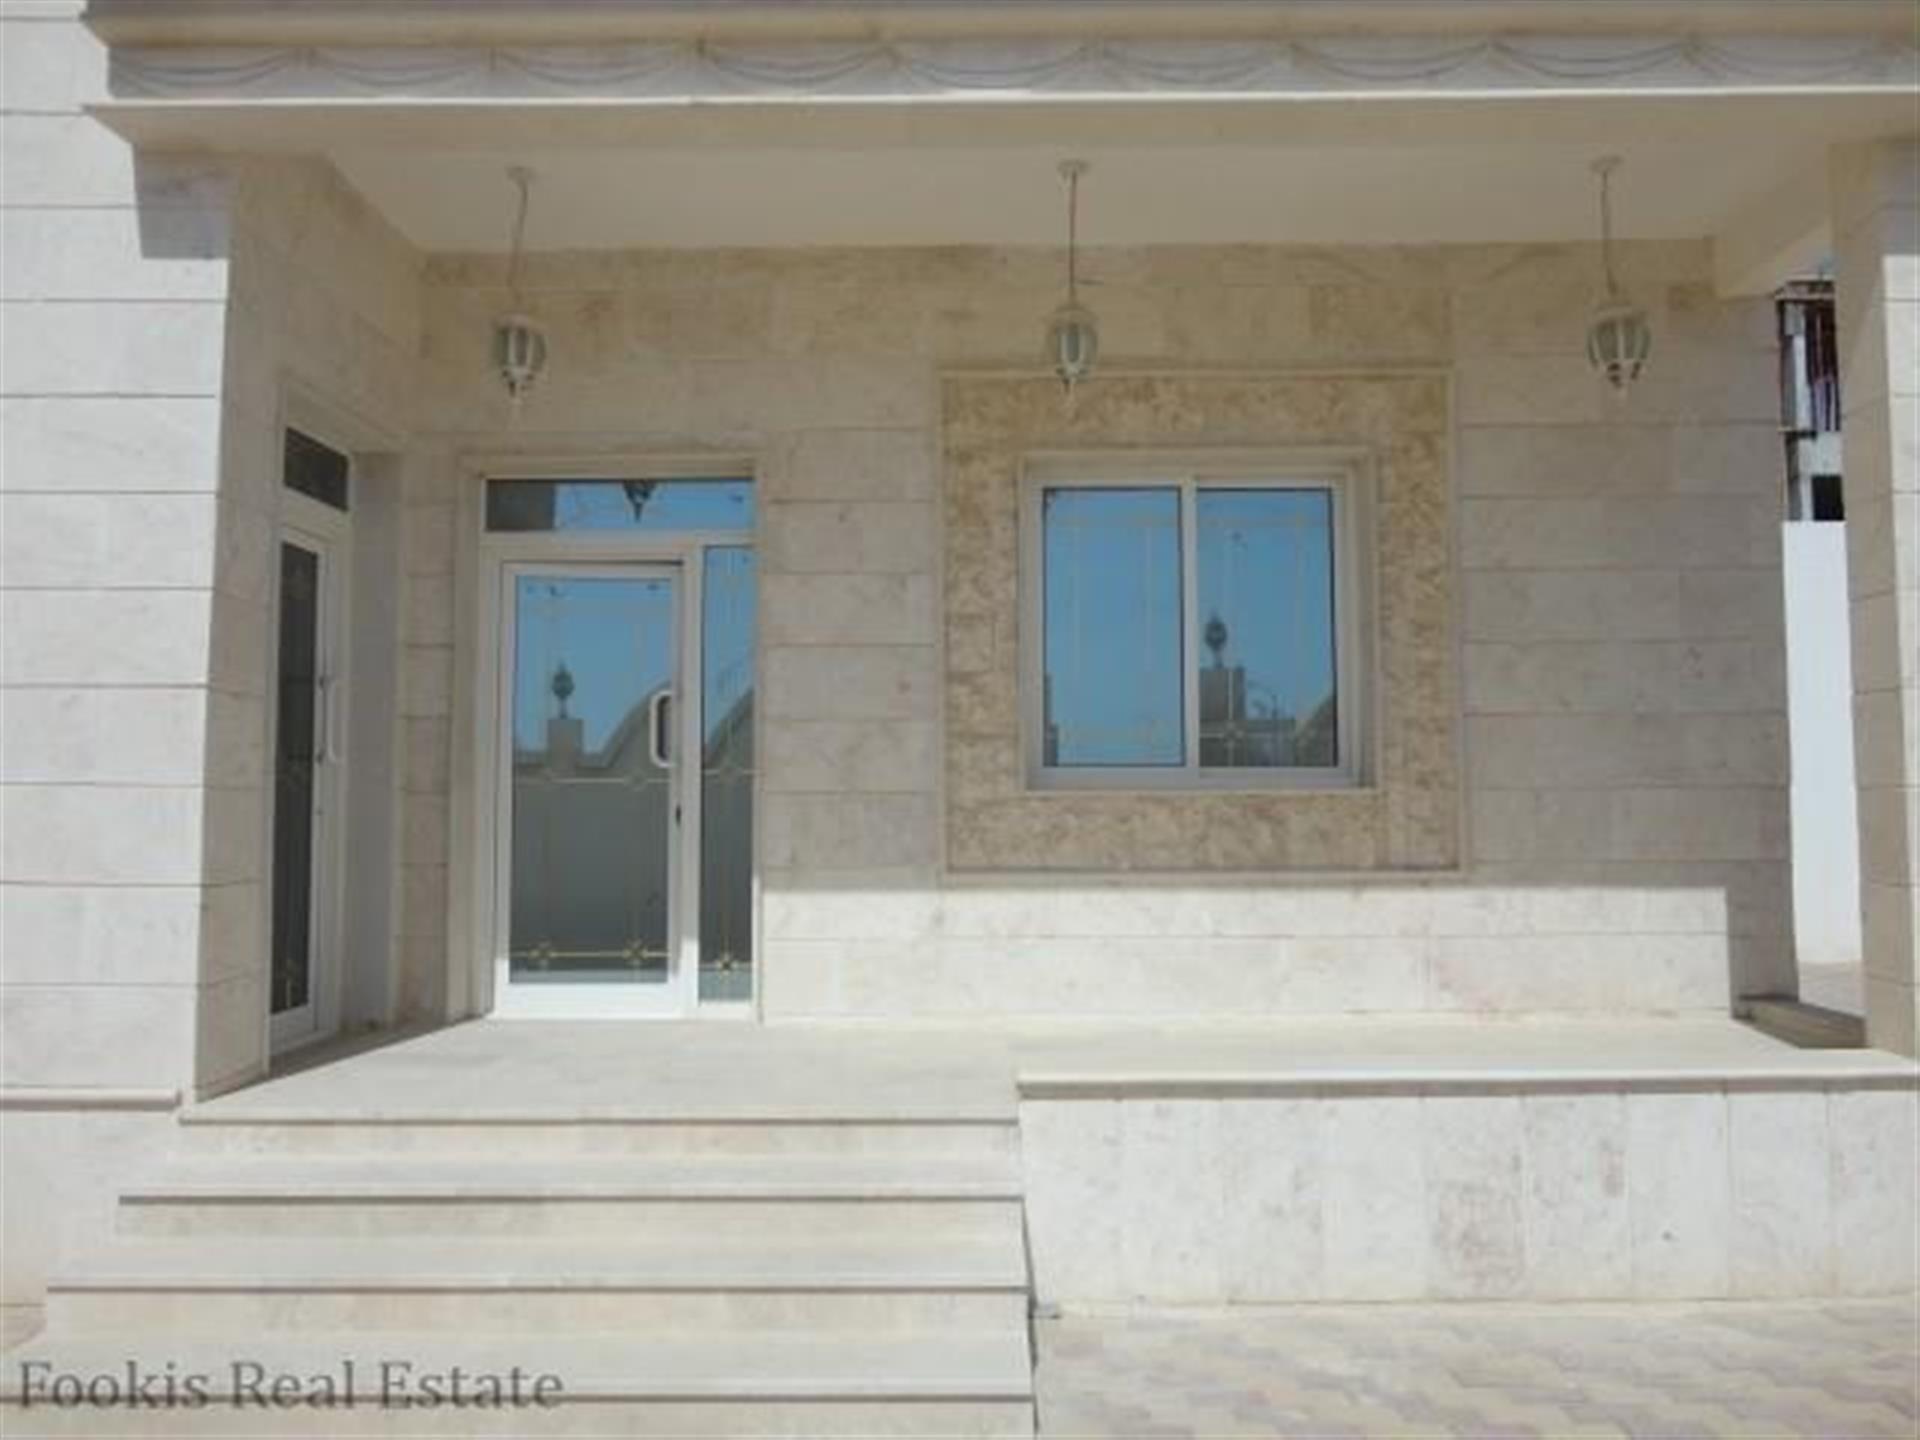 BRAND NEW STAND ALONE VILLA AVAILABLE FOR SALE IN AL KHEESA